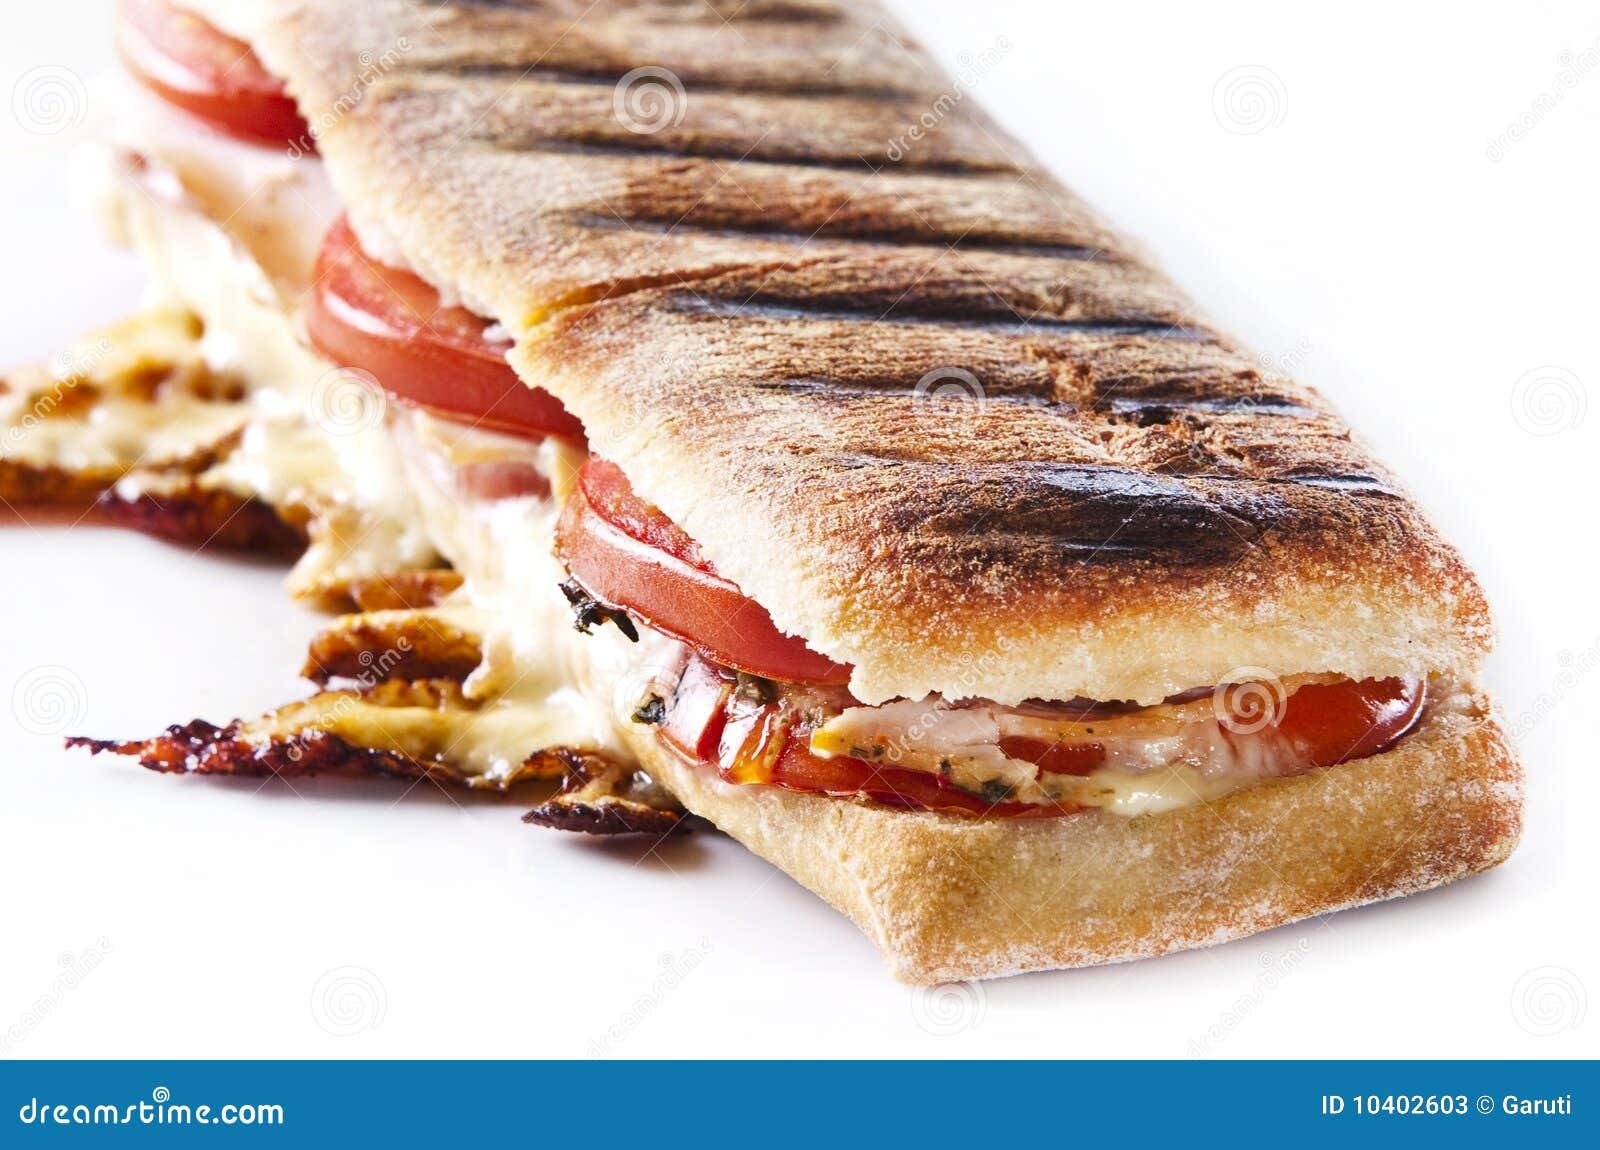 panini-sandwich-10402603.jpg